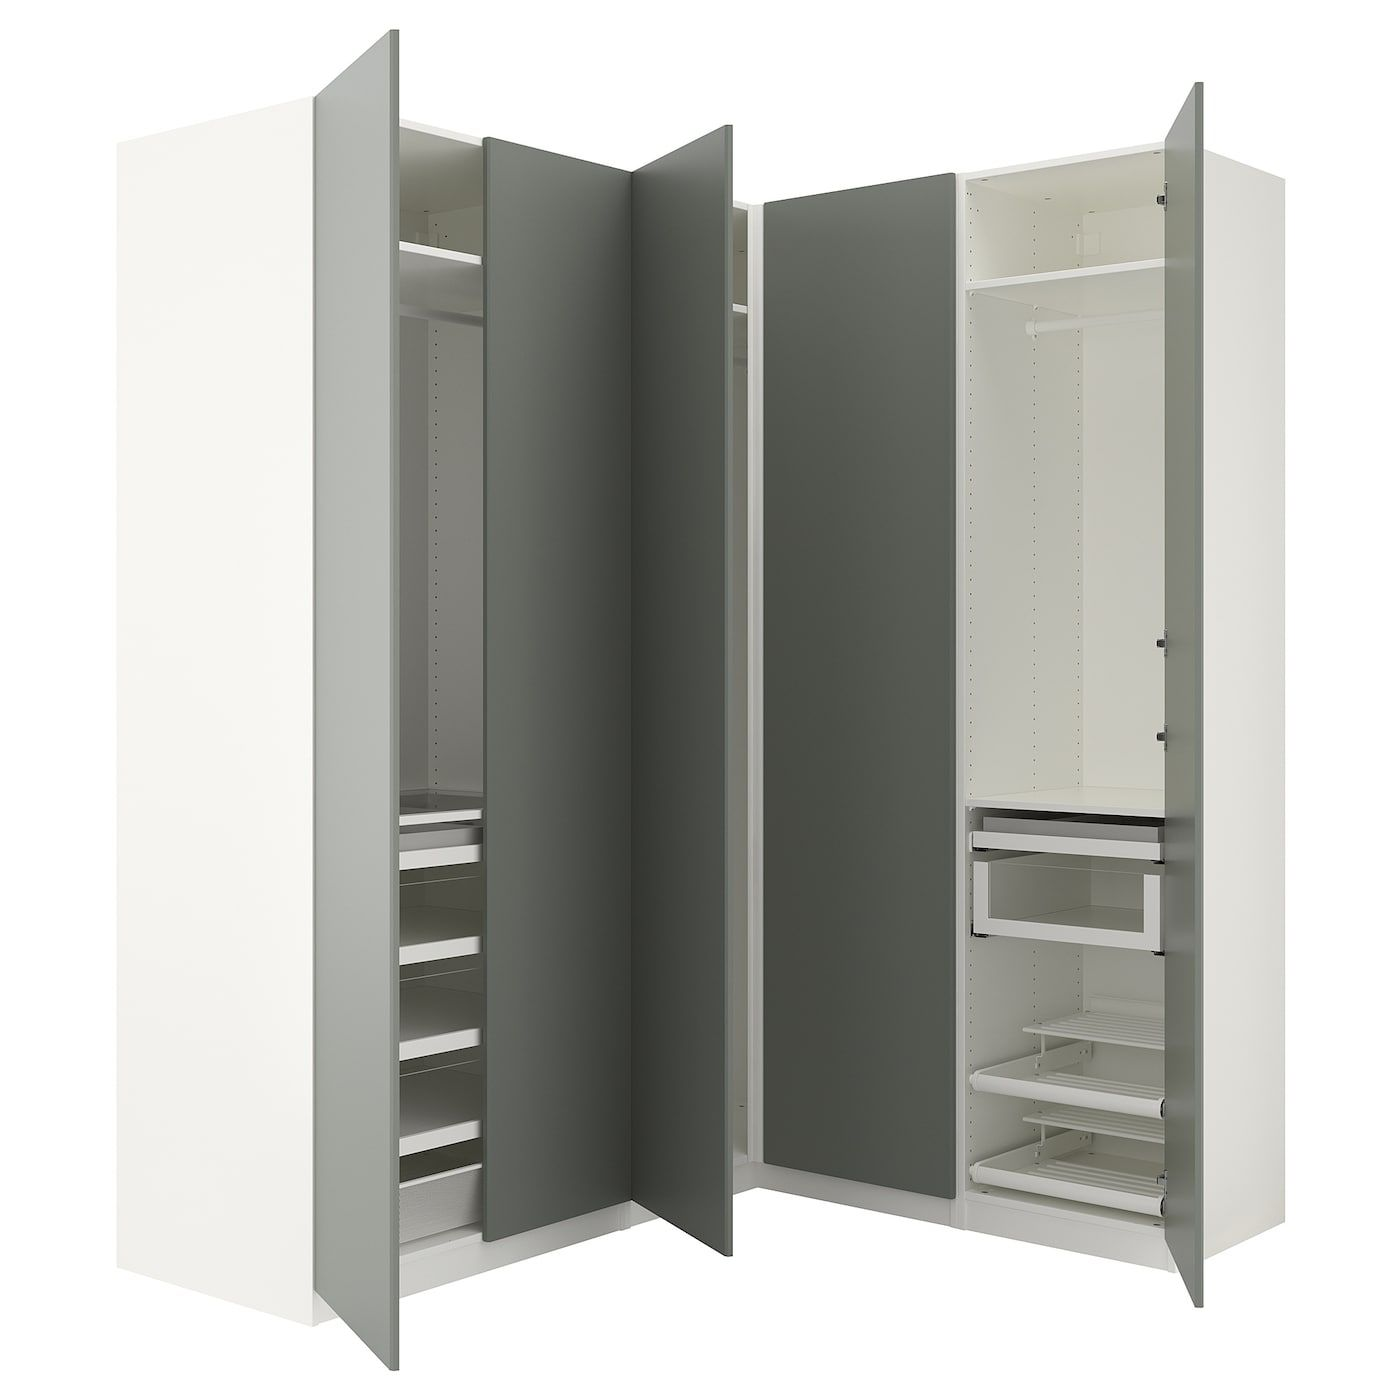 Pax Corner Wardrobe White Reinsvoll Gray Green 82 3 4 63 1 8x93 1 8 Ikea Pax Ikea Guarda Roupa Casal Planejado